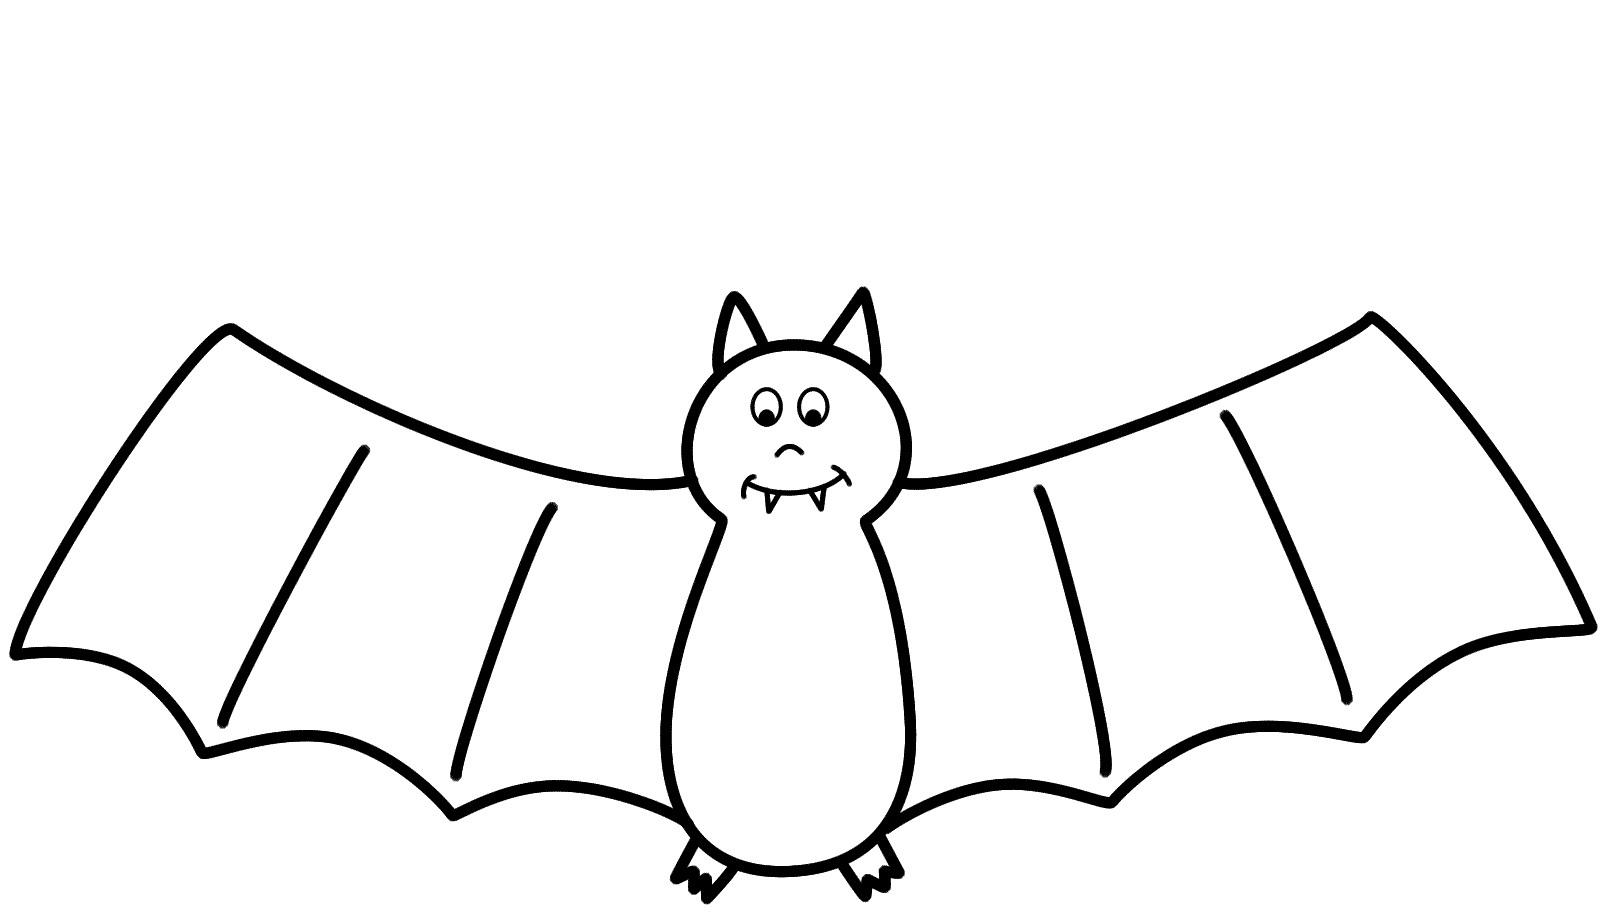 Bat dot to dot  Free Printable Coloring Pages